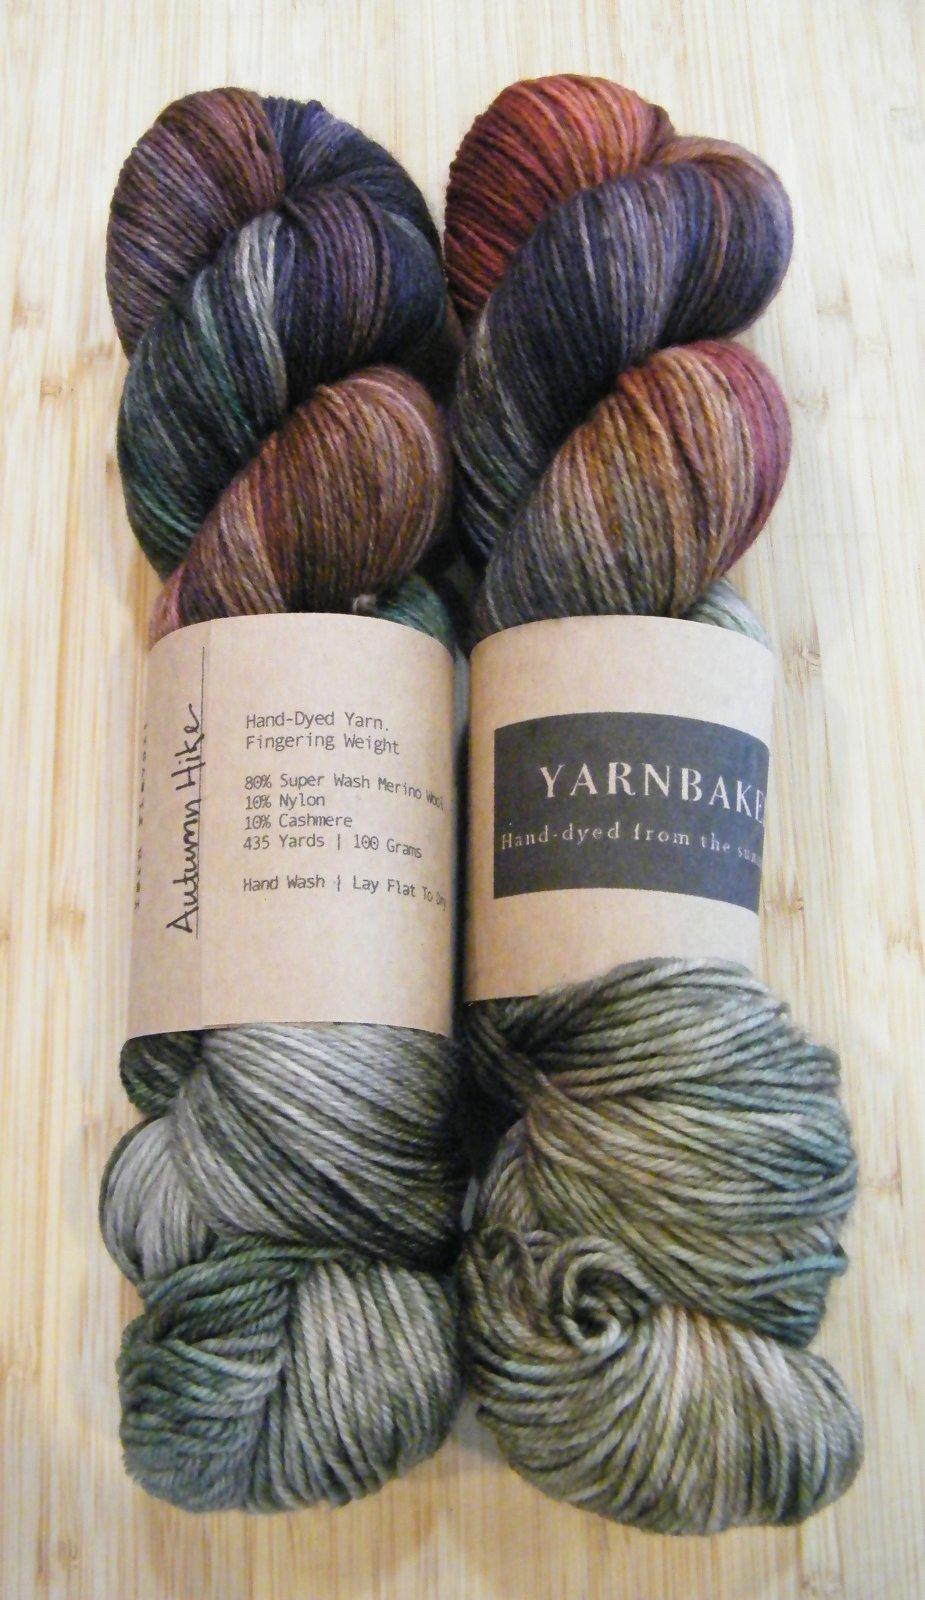 Yarnbaker Hand-Dyed Fingering Yarn